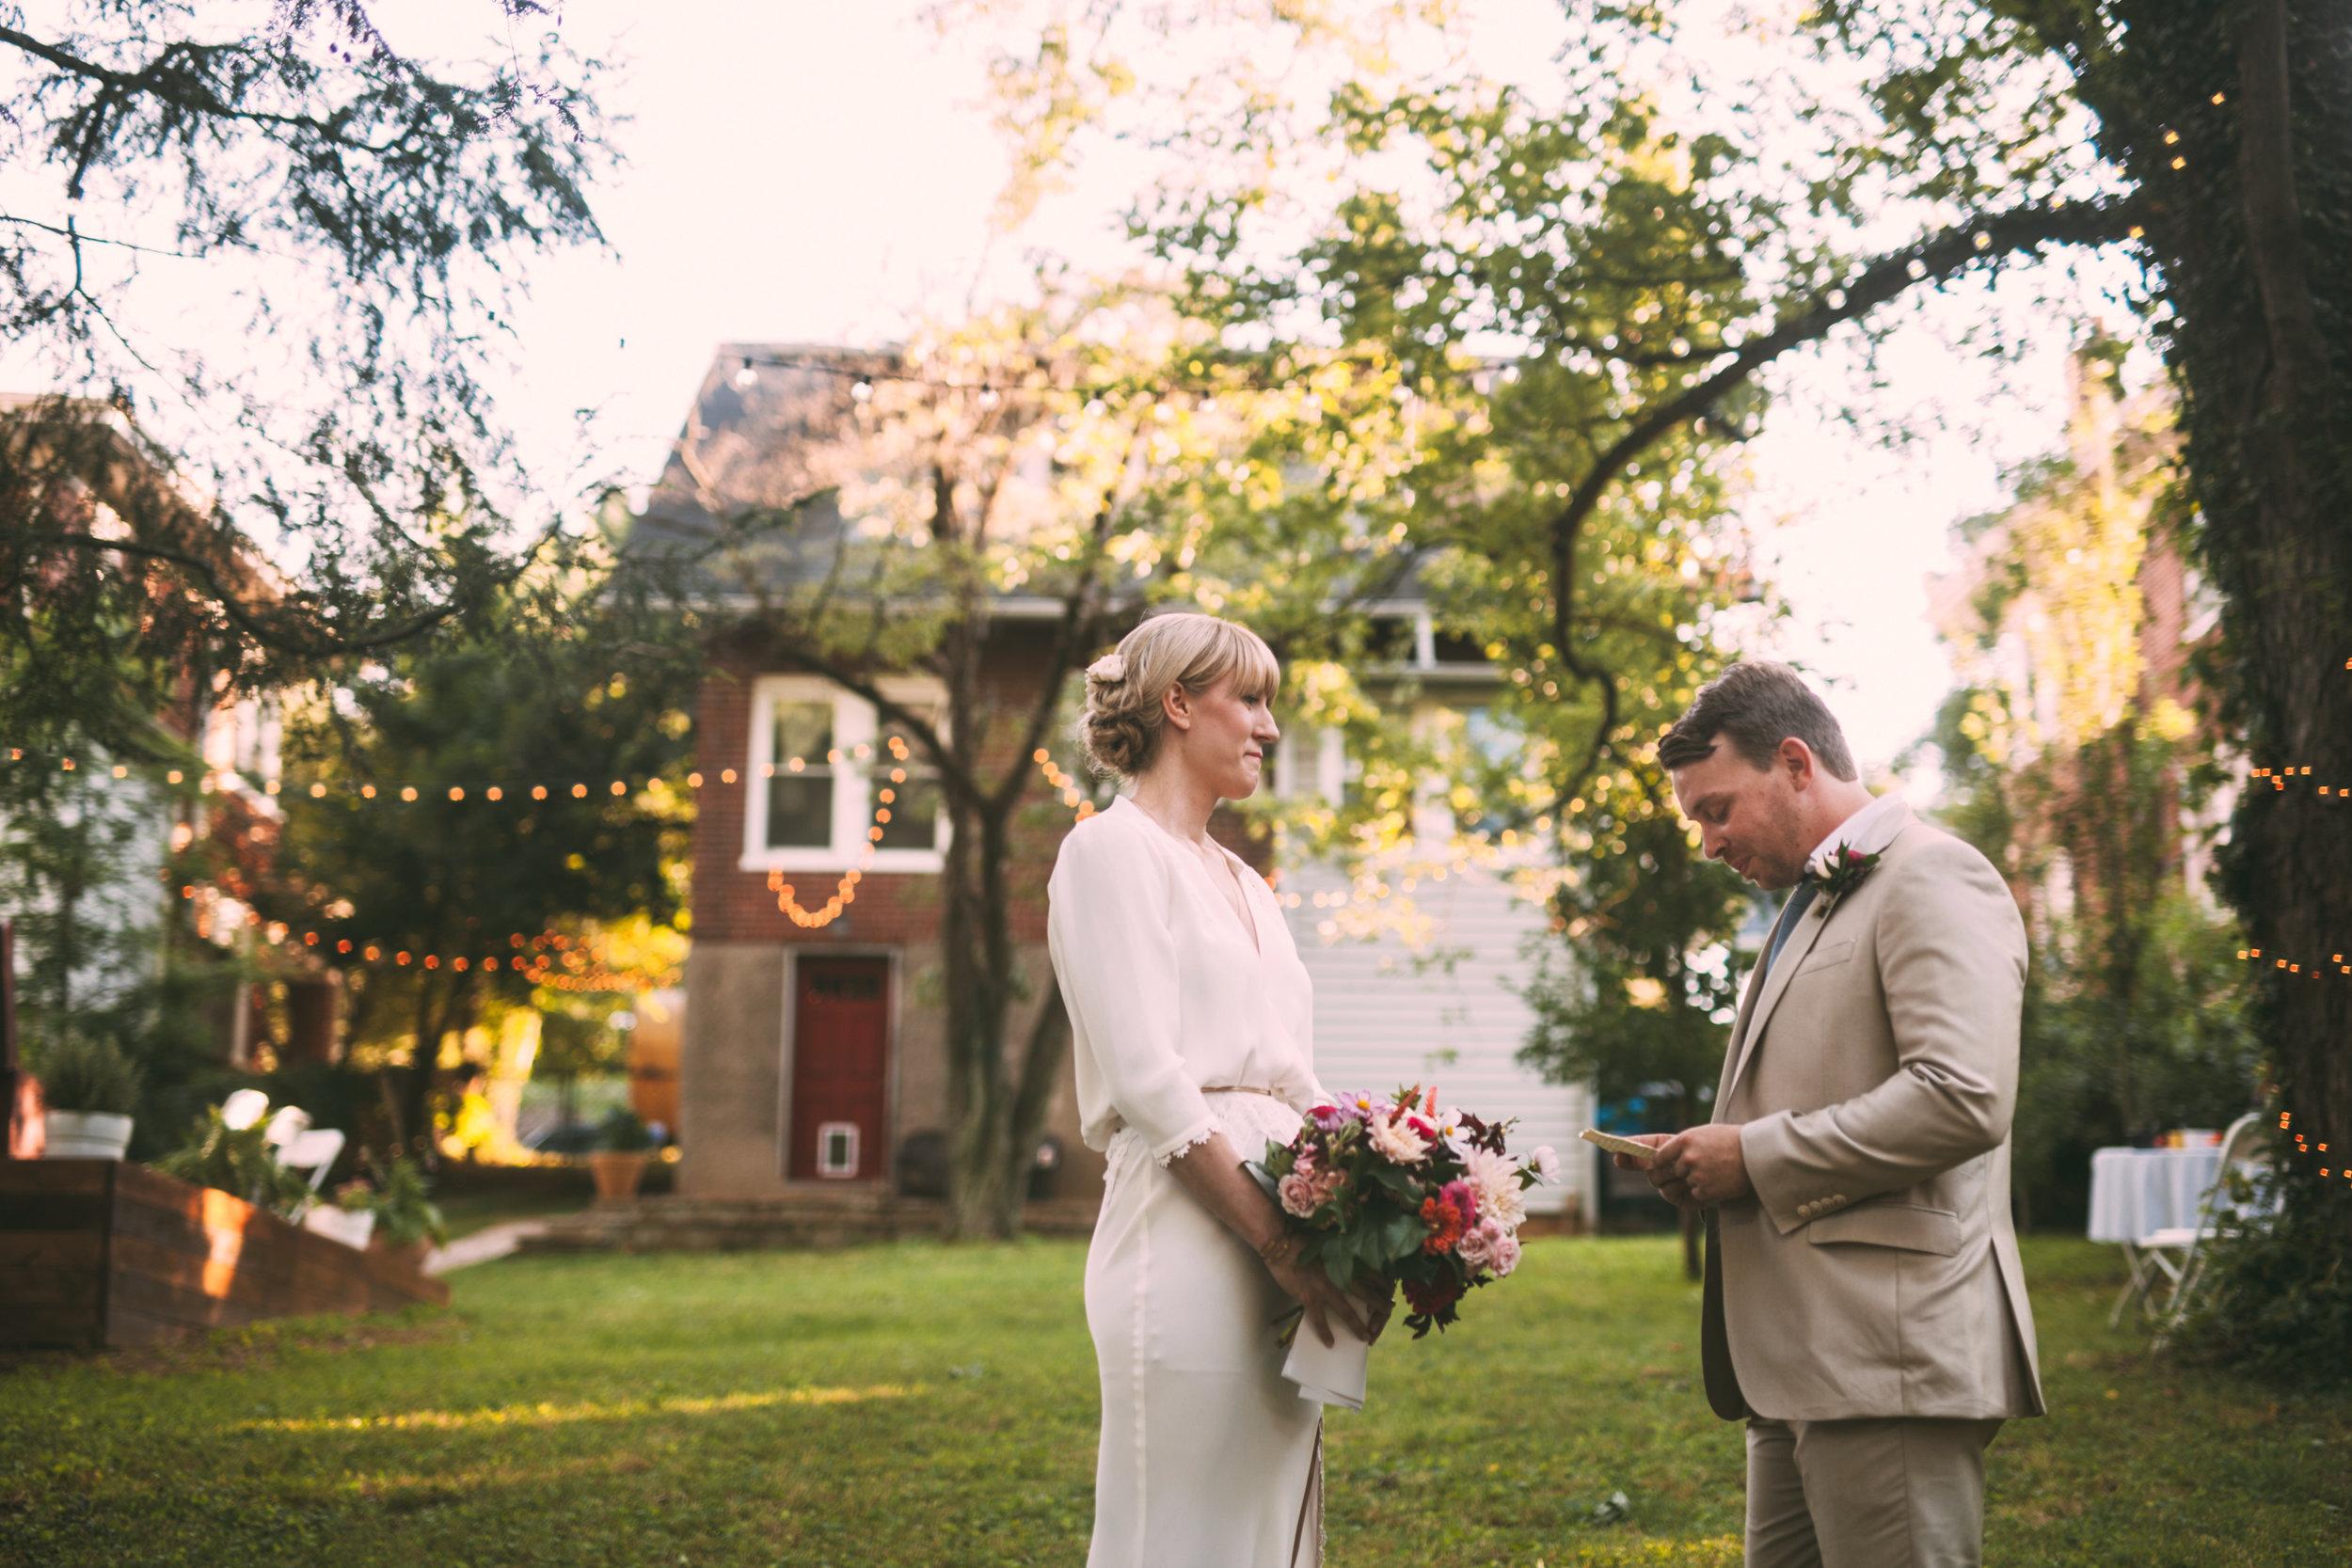 Hunter + Heidi, Married - 20160709-190734 - Web Size W New Agfa Edit.JPG